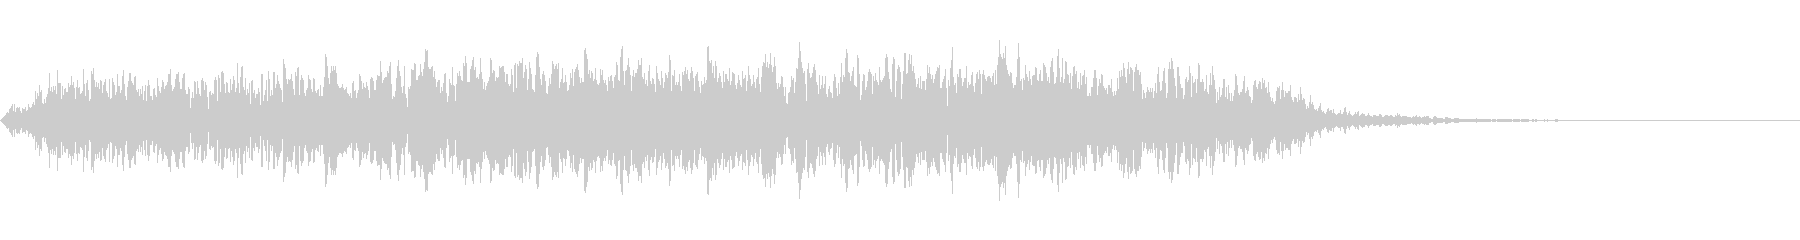 SciFi EC01_84_2の未再生の波形